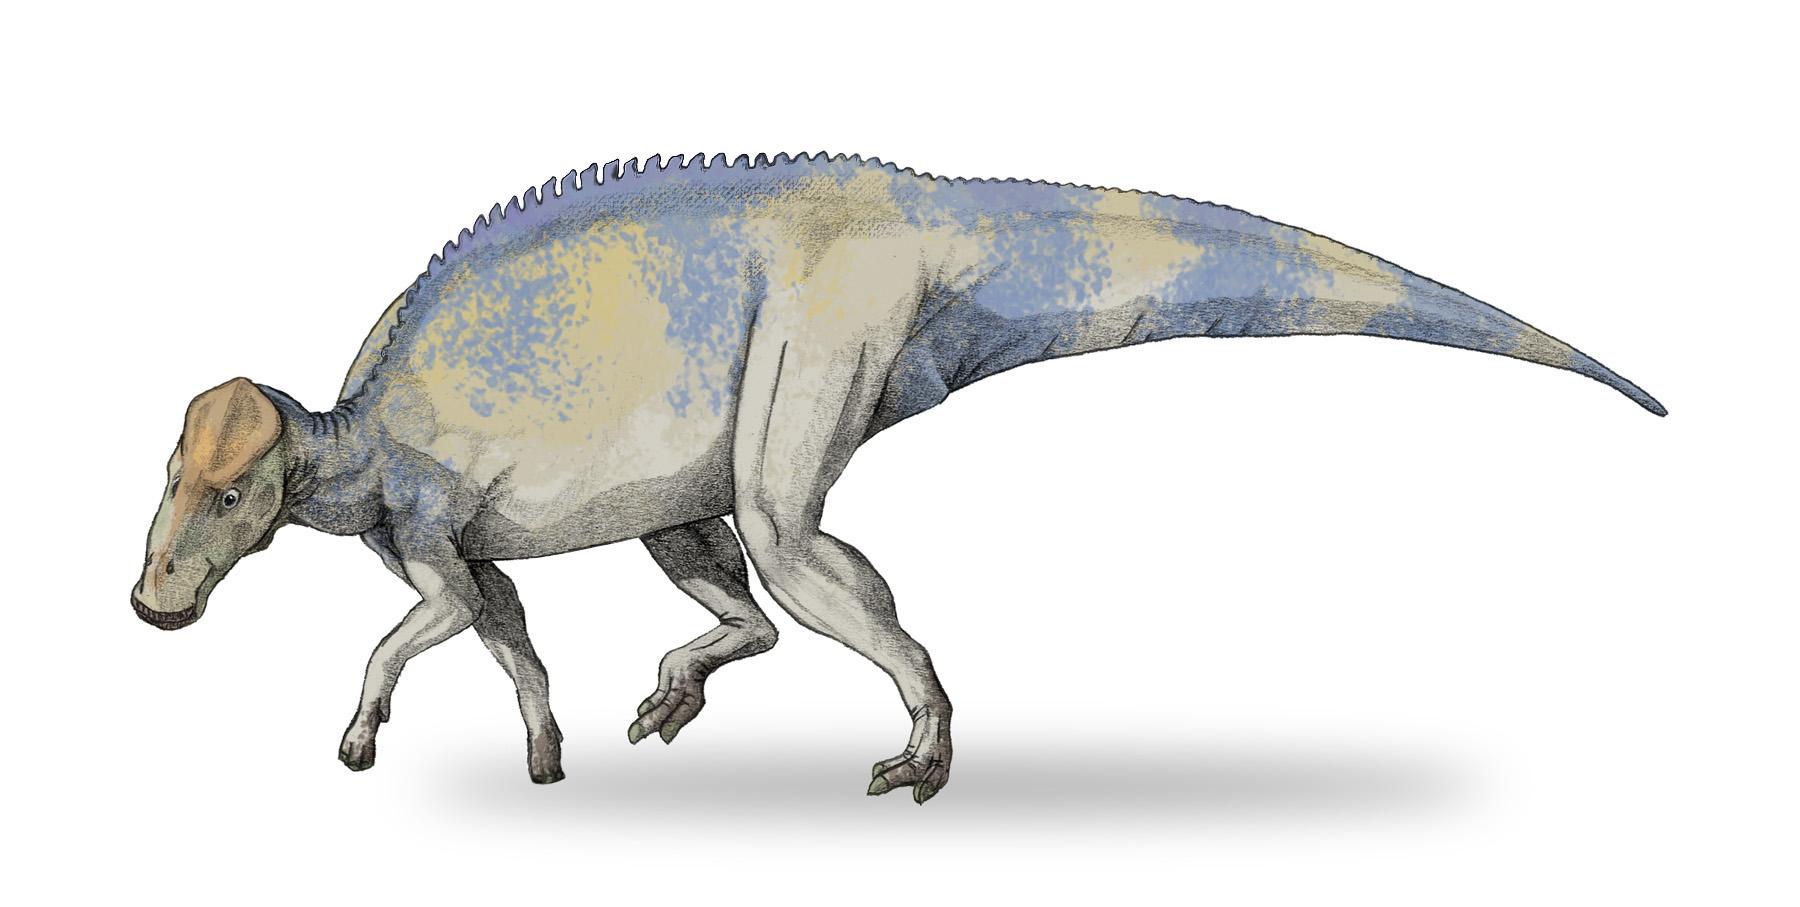 Brachylophosaurus, Foto: officeboots.net